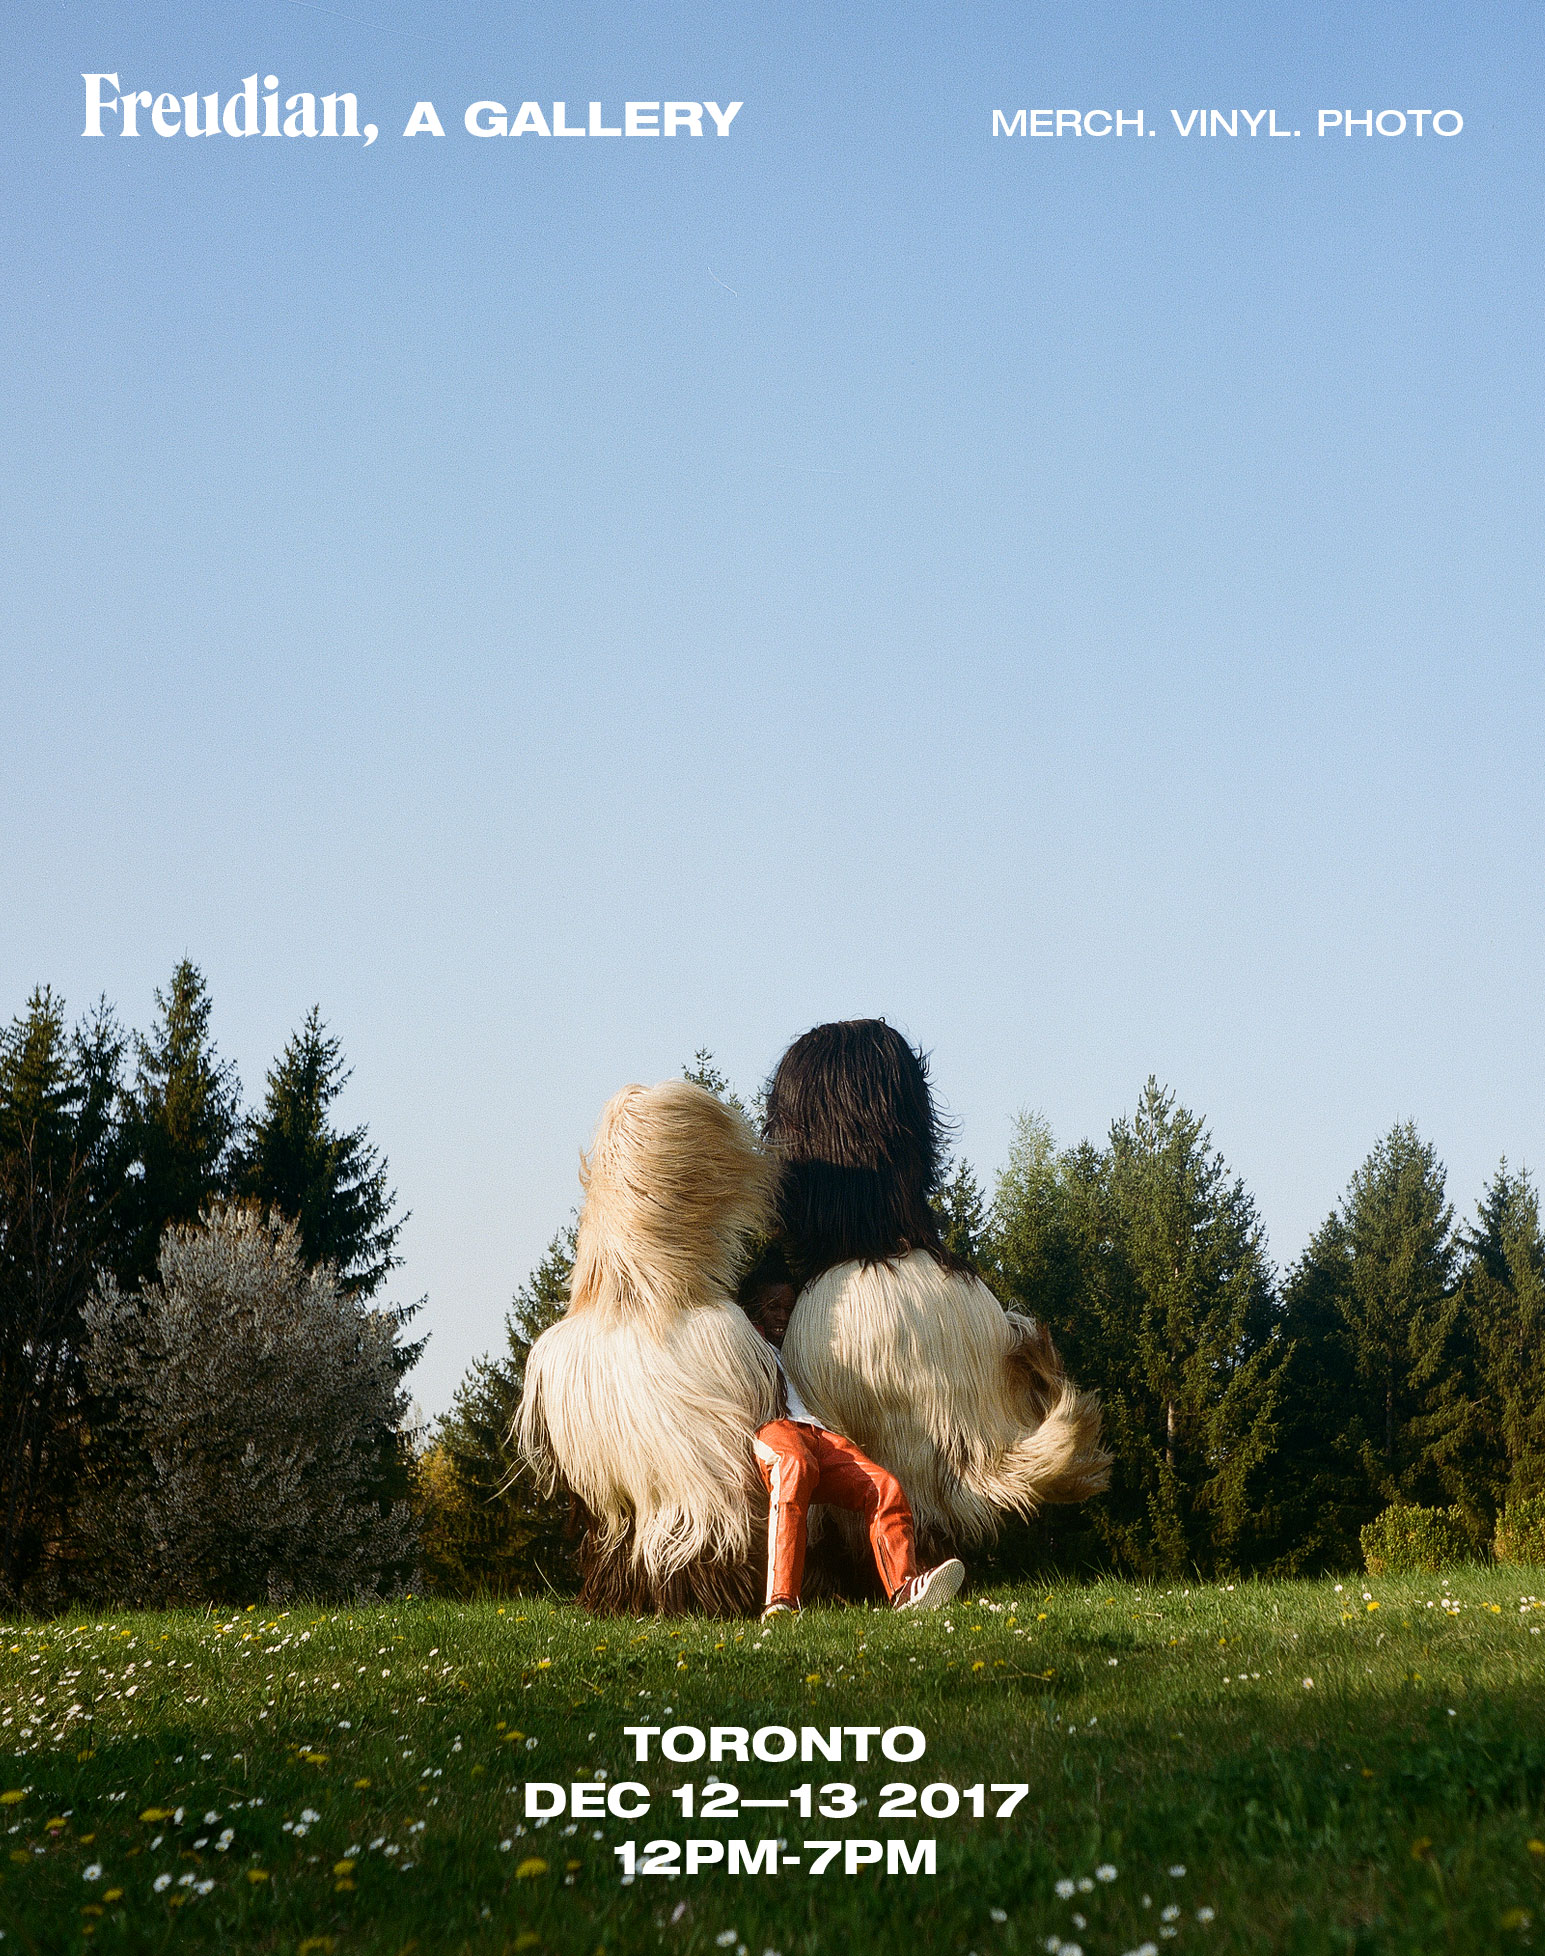 Freudian_Gallery_Poster_Teaser_02.jpg